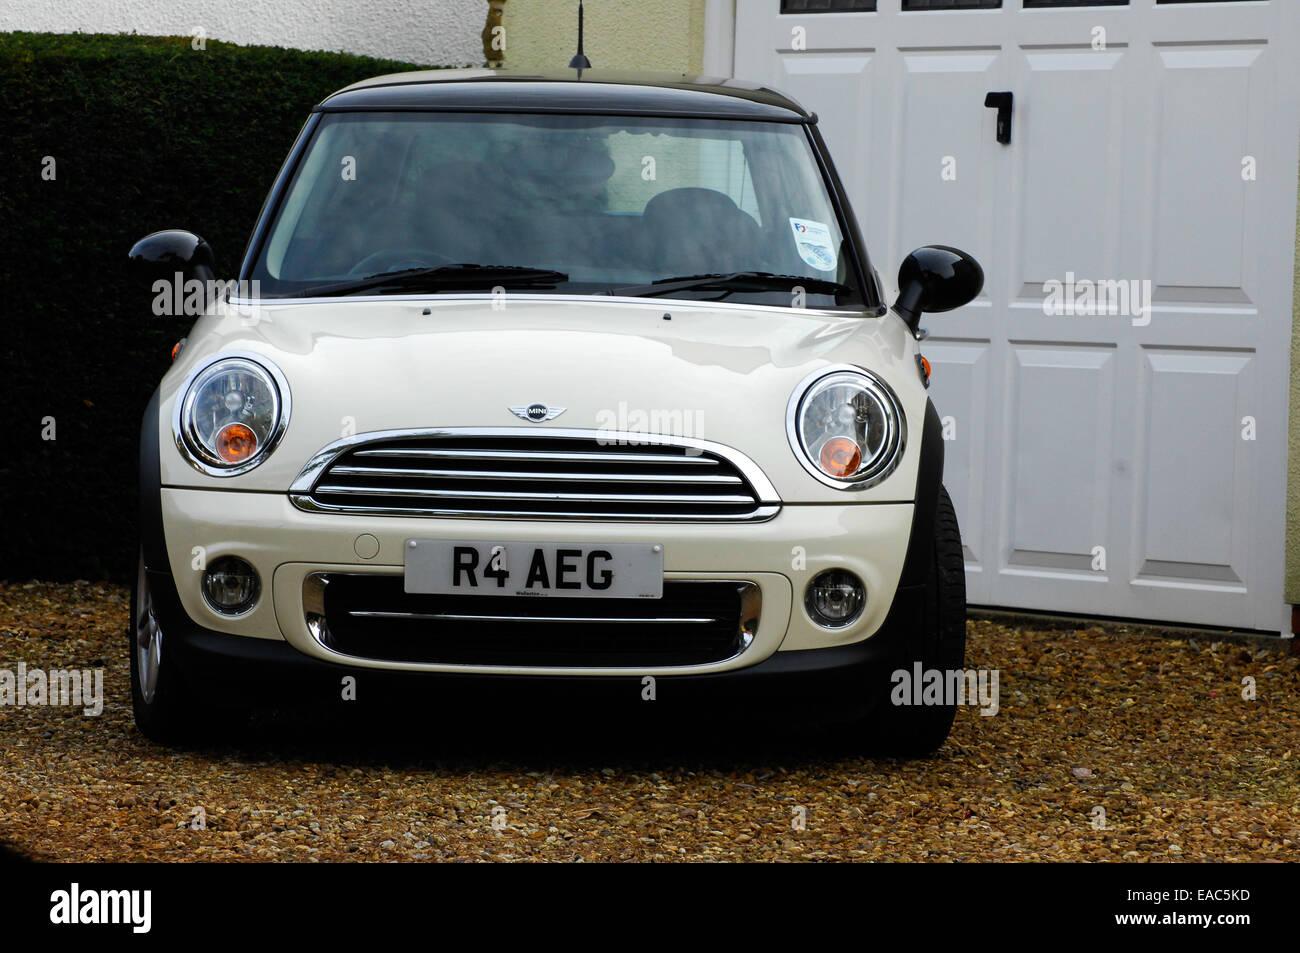 White Mini motor car - Stock Image